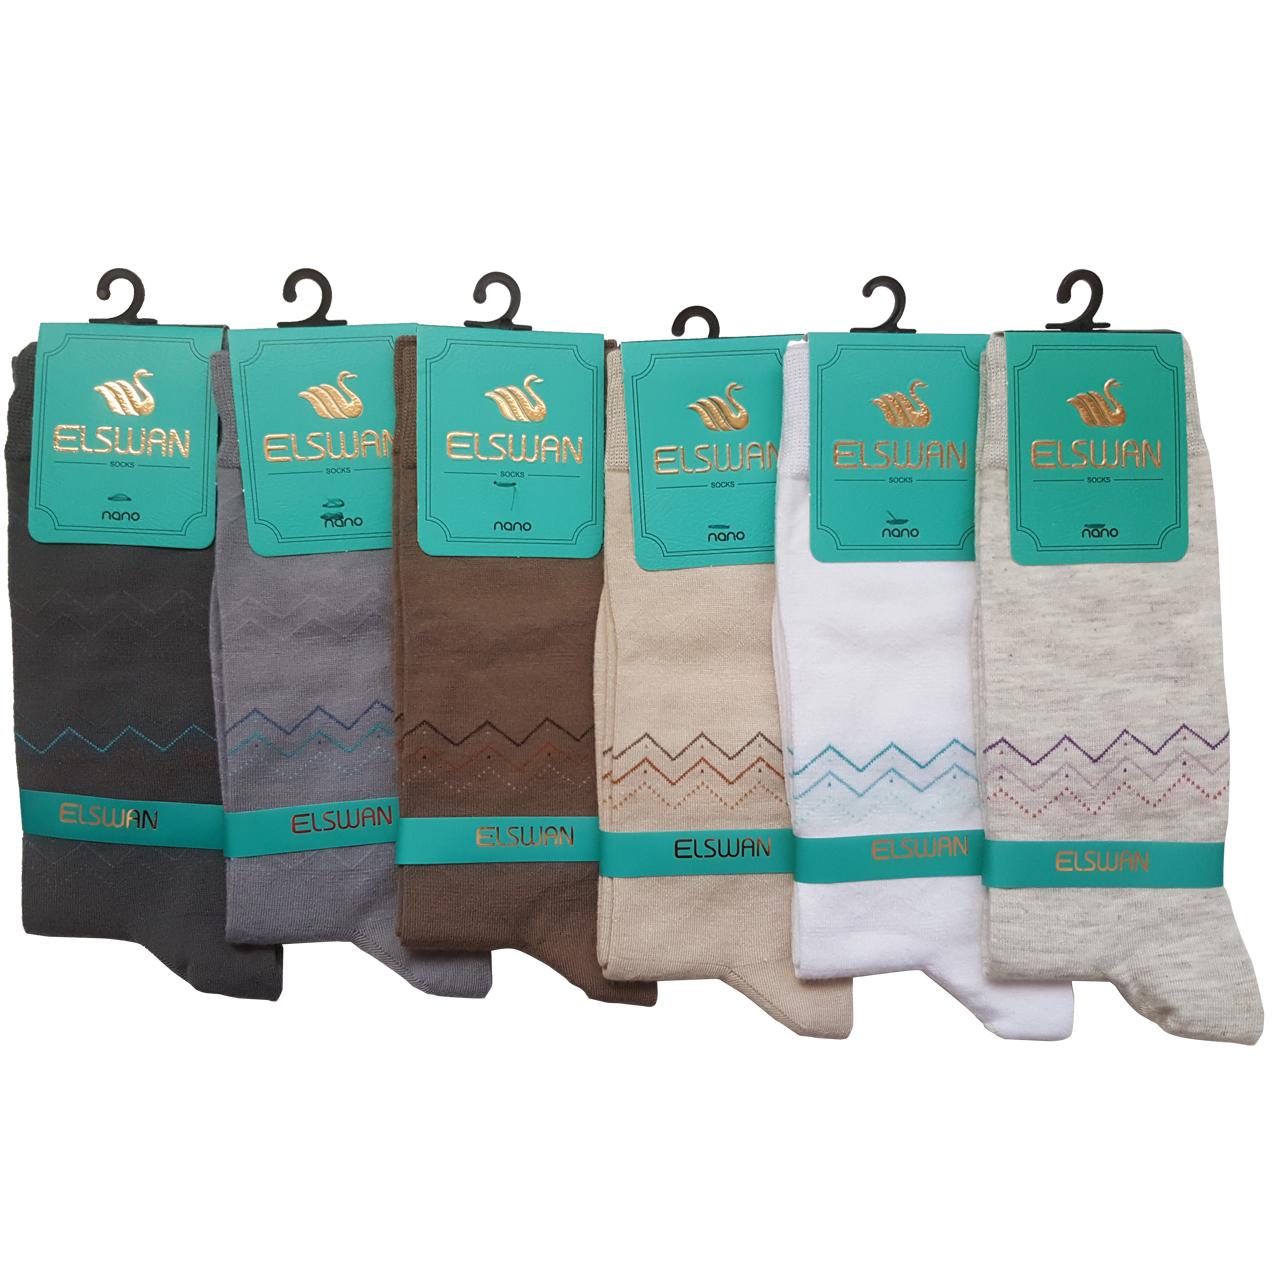 جوراب مردانه ال سون طرح راین کد PH32 مجموعه 6 عددی